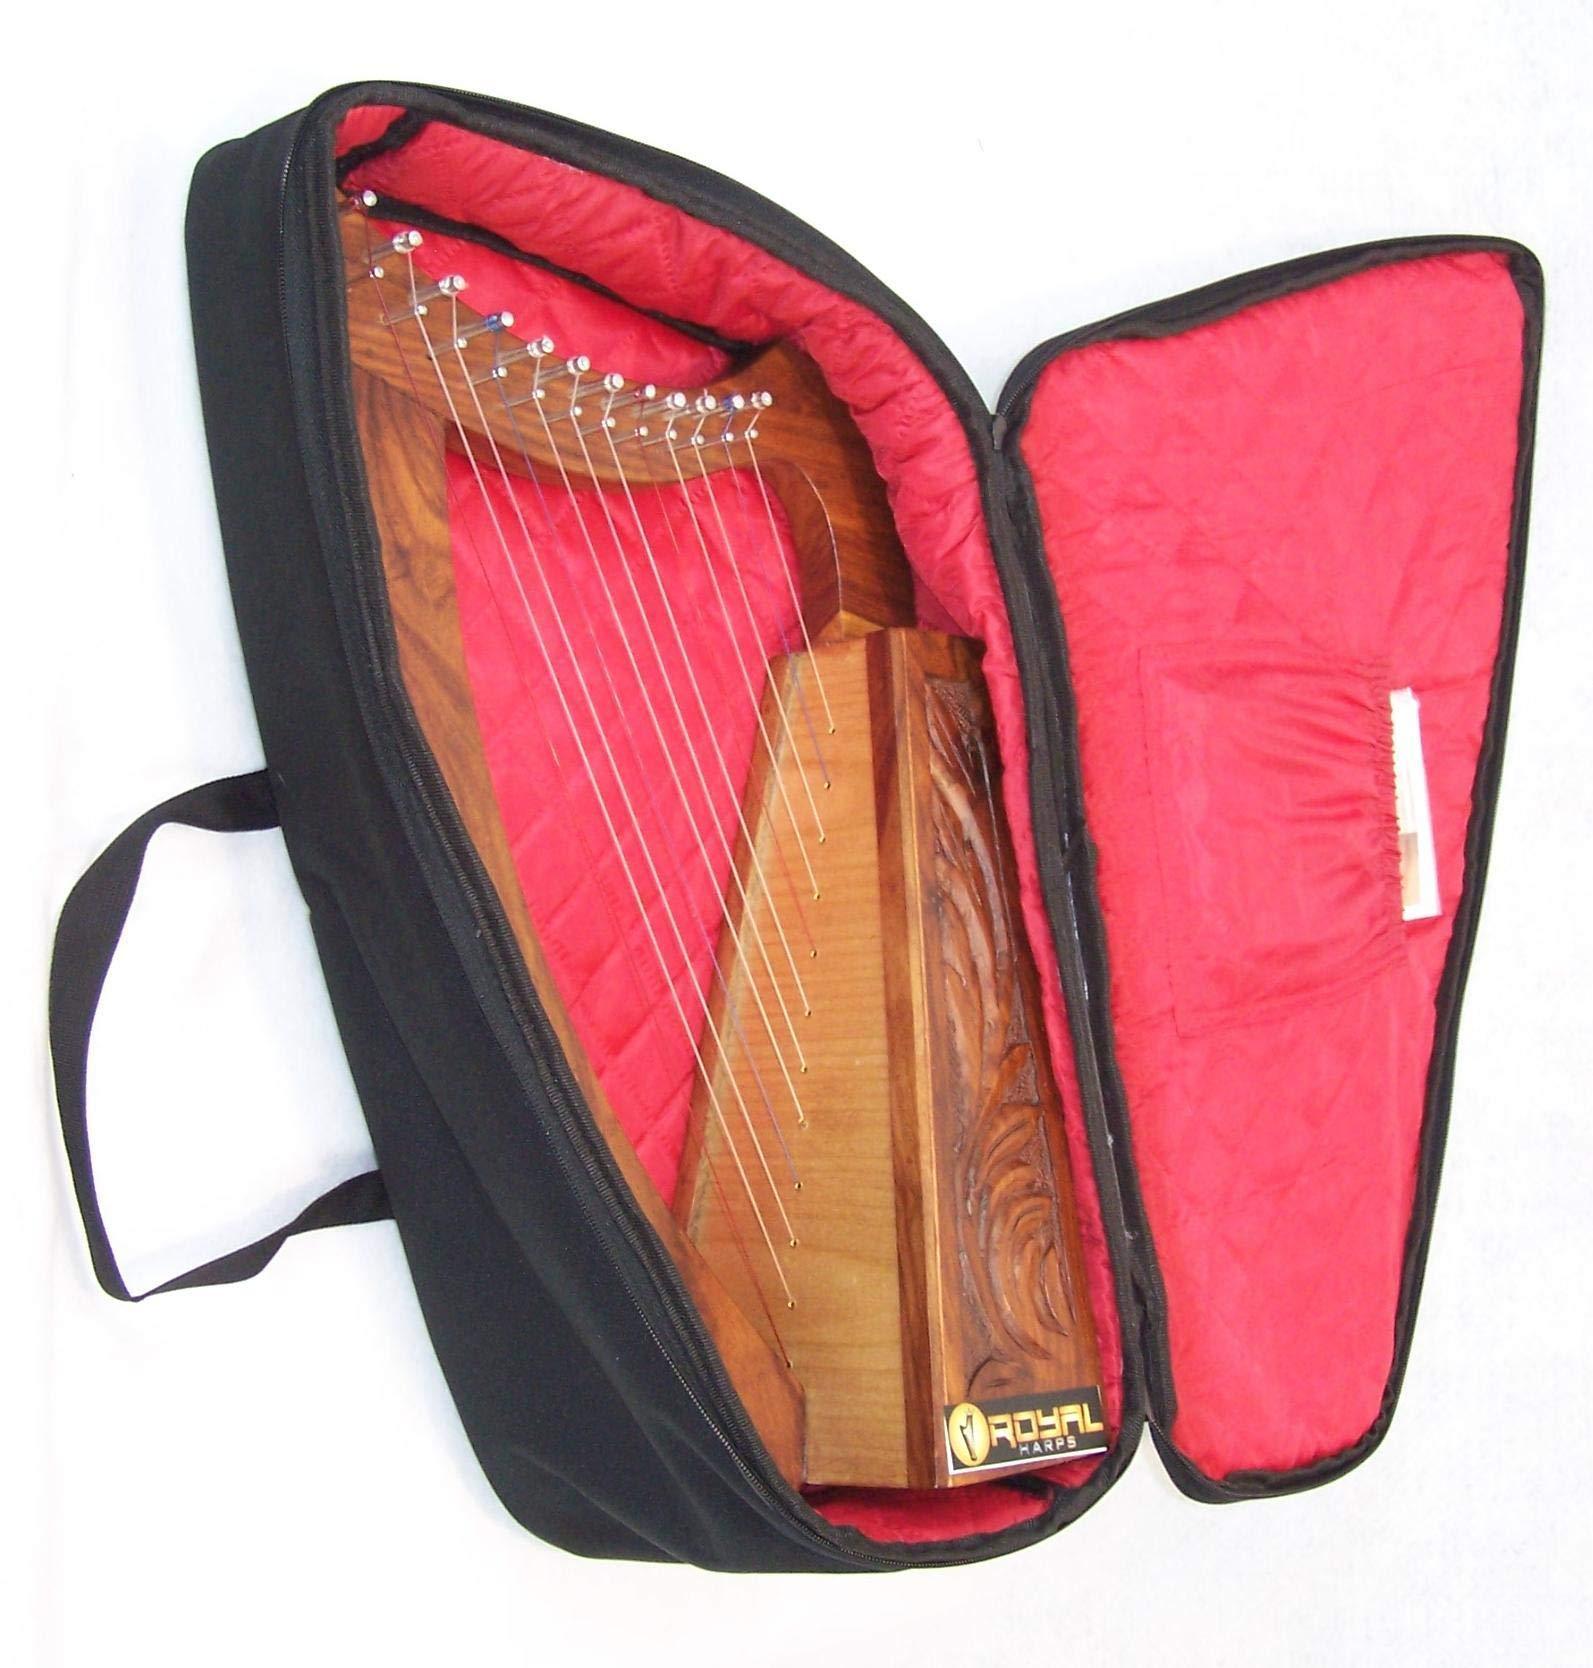 Celtic Irish Baby Harp 12 Strings Solid Wood Free Bag Strings Key by ROYAL HARPS (Image #4)